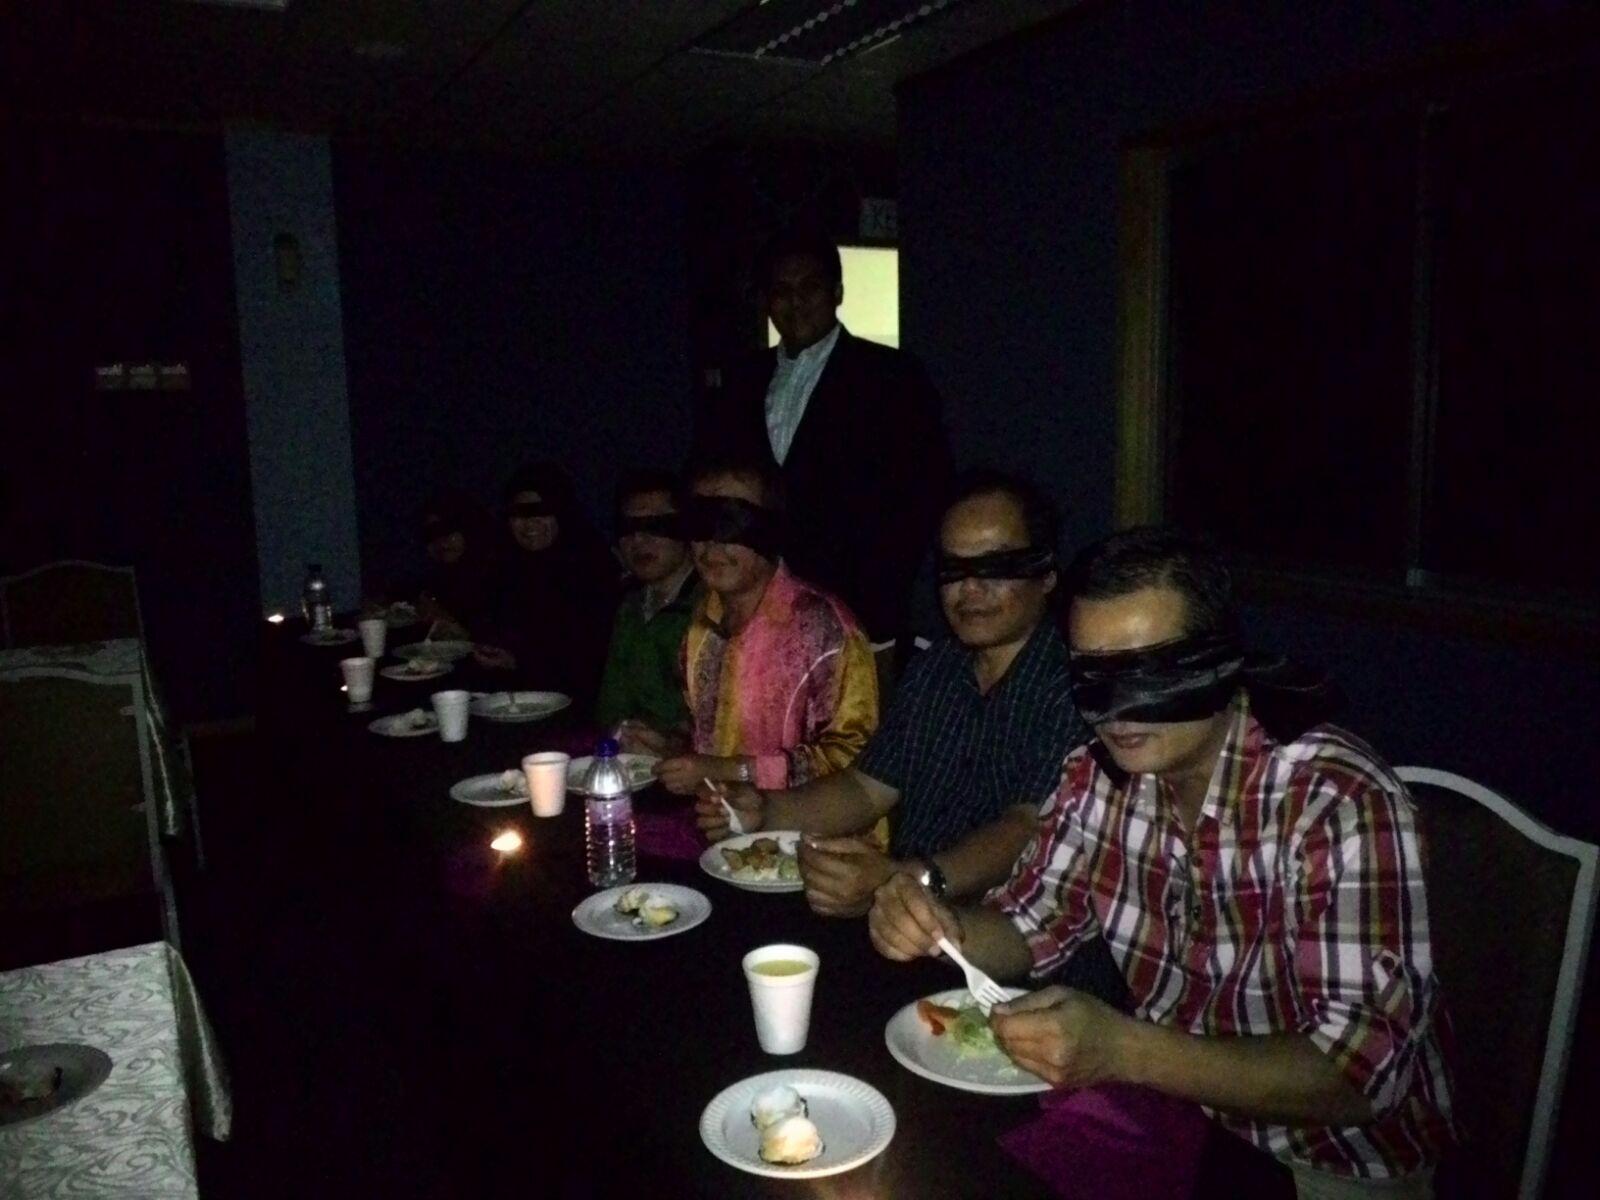 dans le noir dining in the dark 3